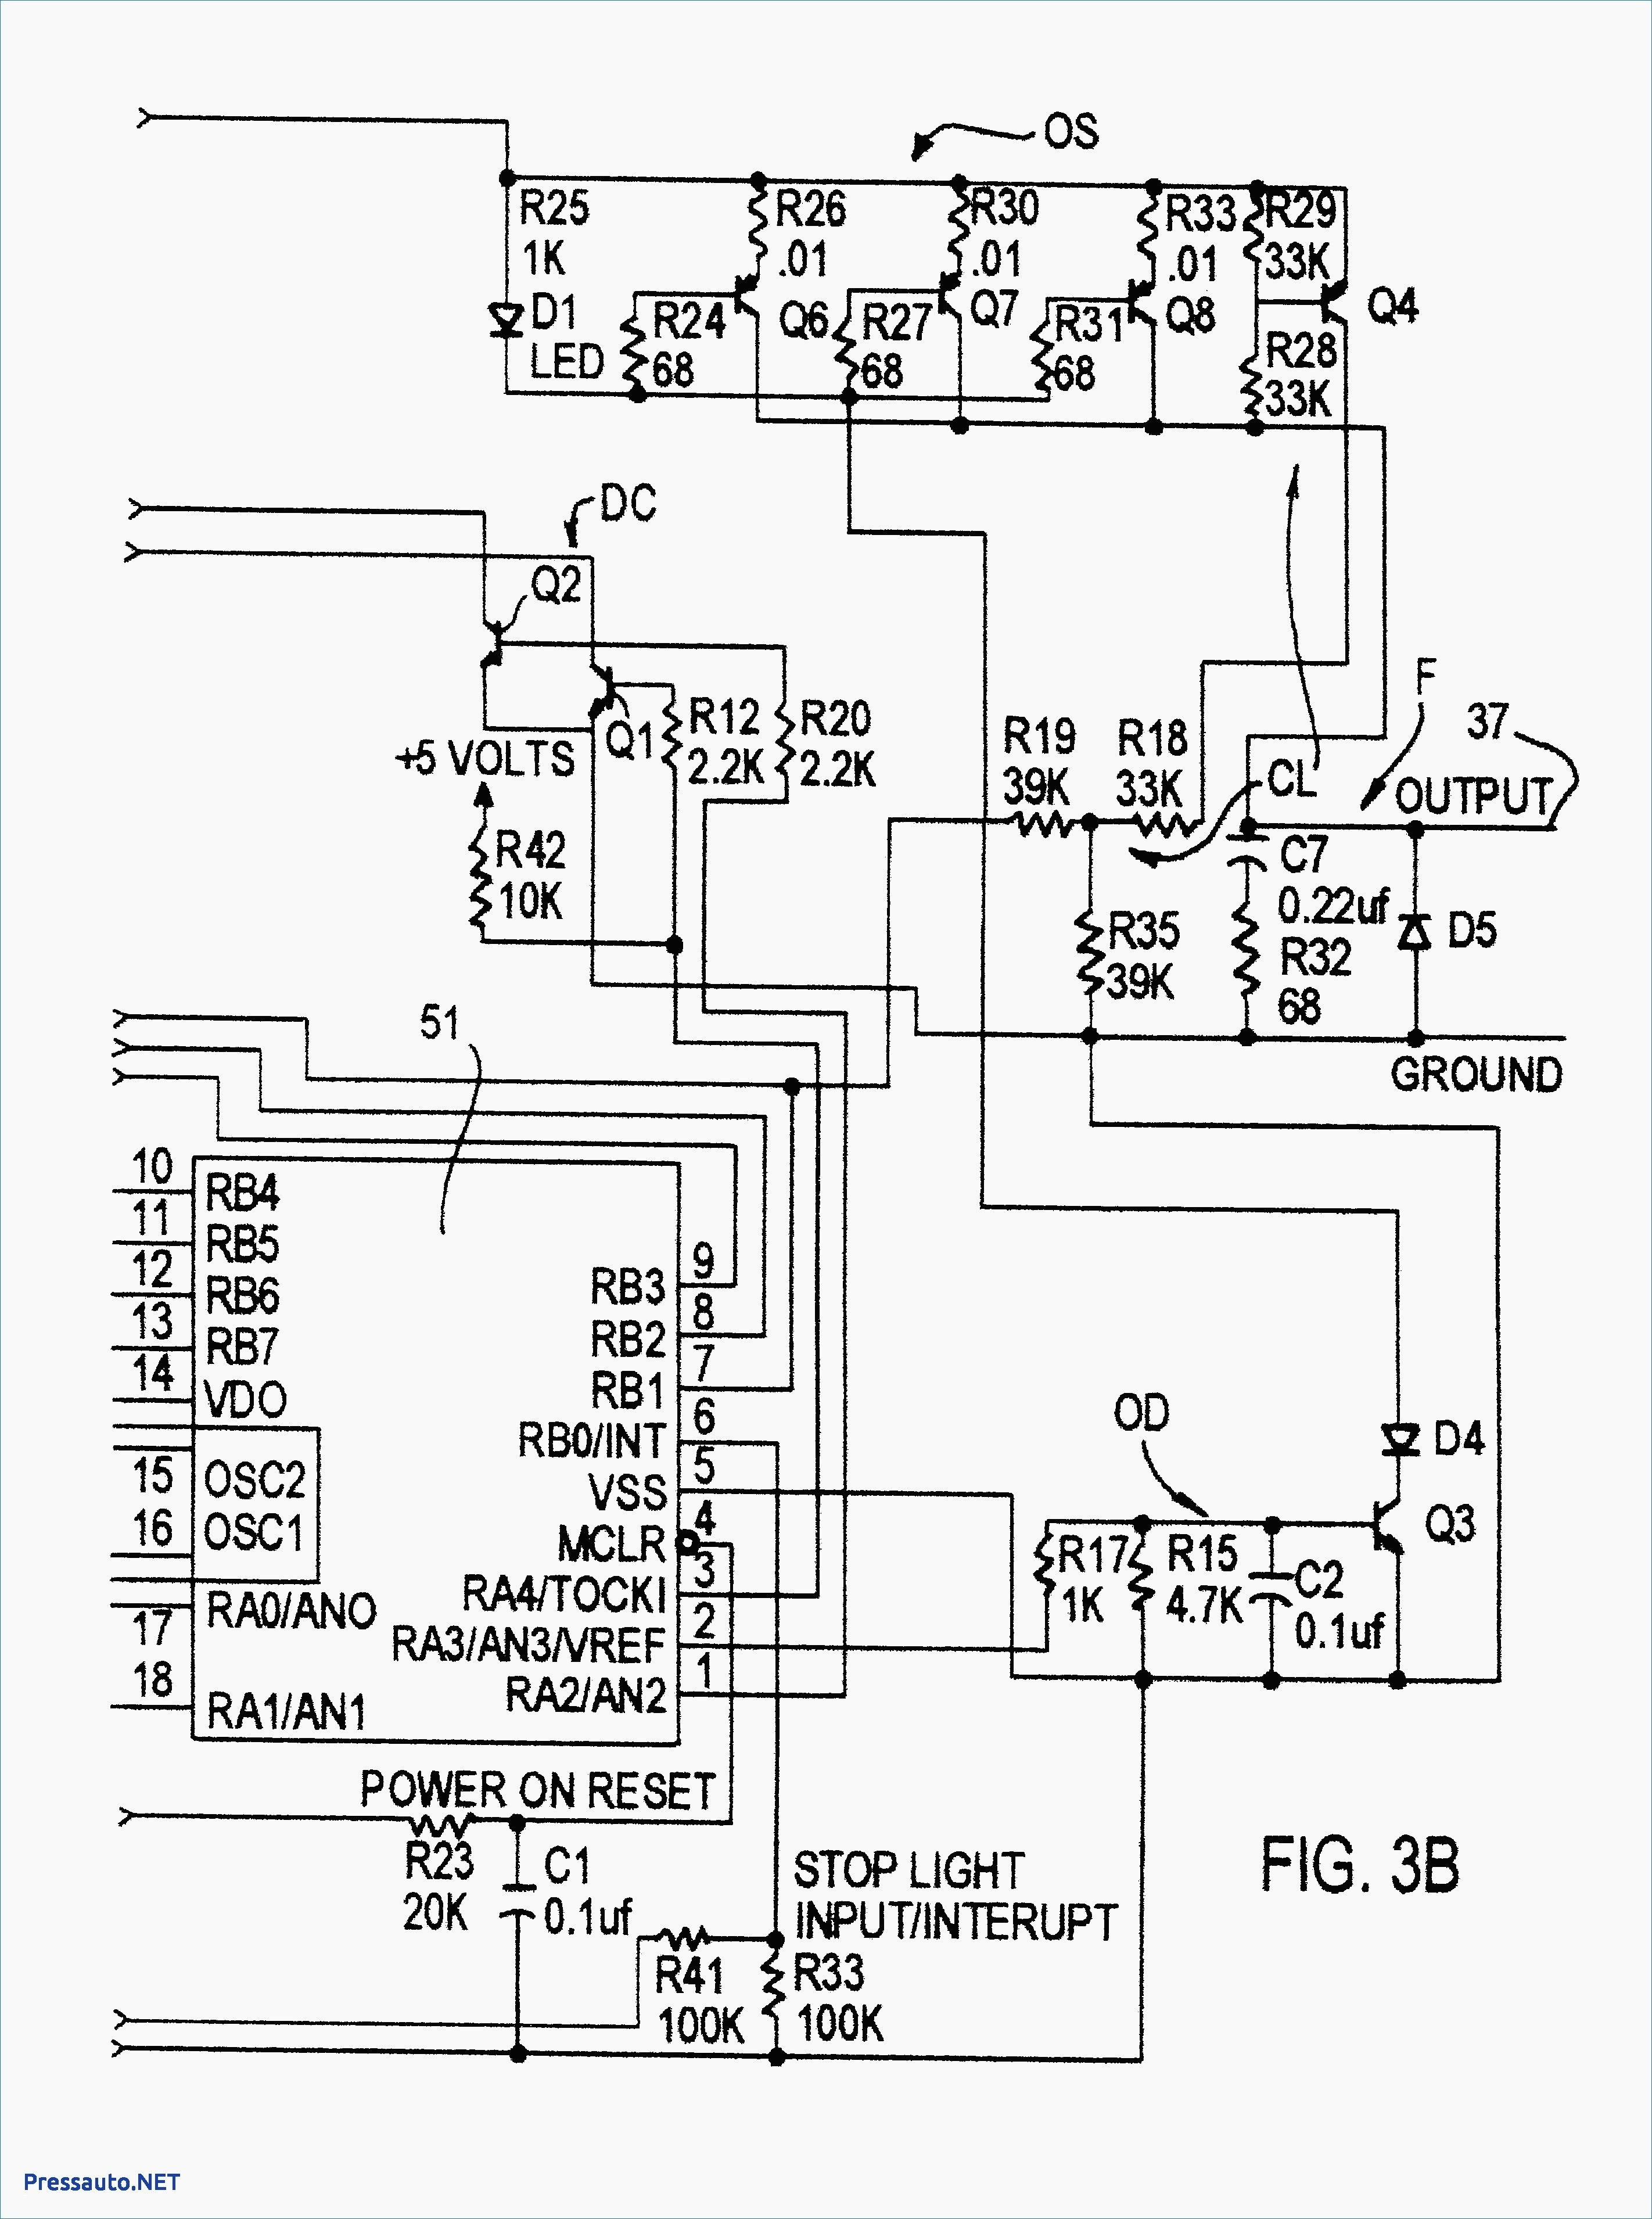 elegant cucv wiring diagram wiring diagram image 1997 chevrolet blazer wiring  diagram auto meter wiring diagrams